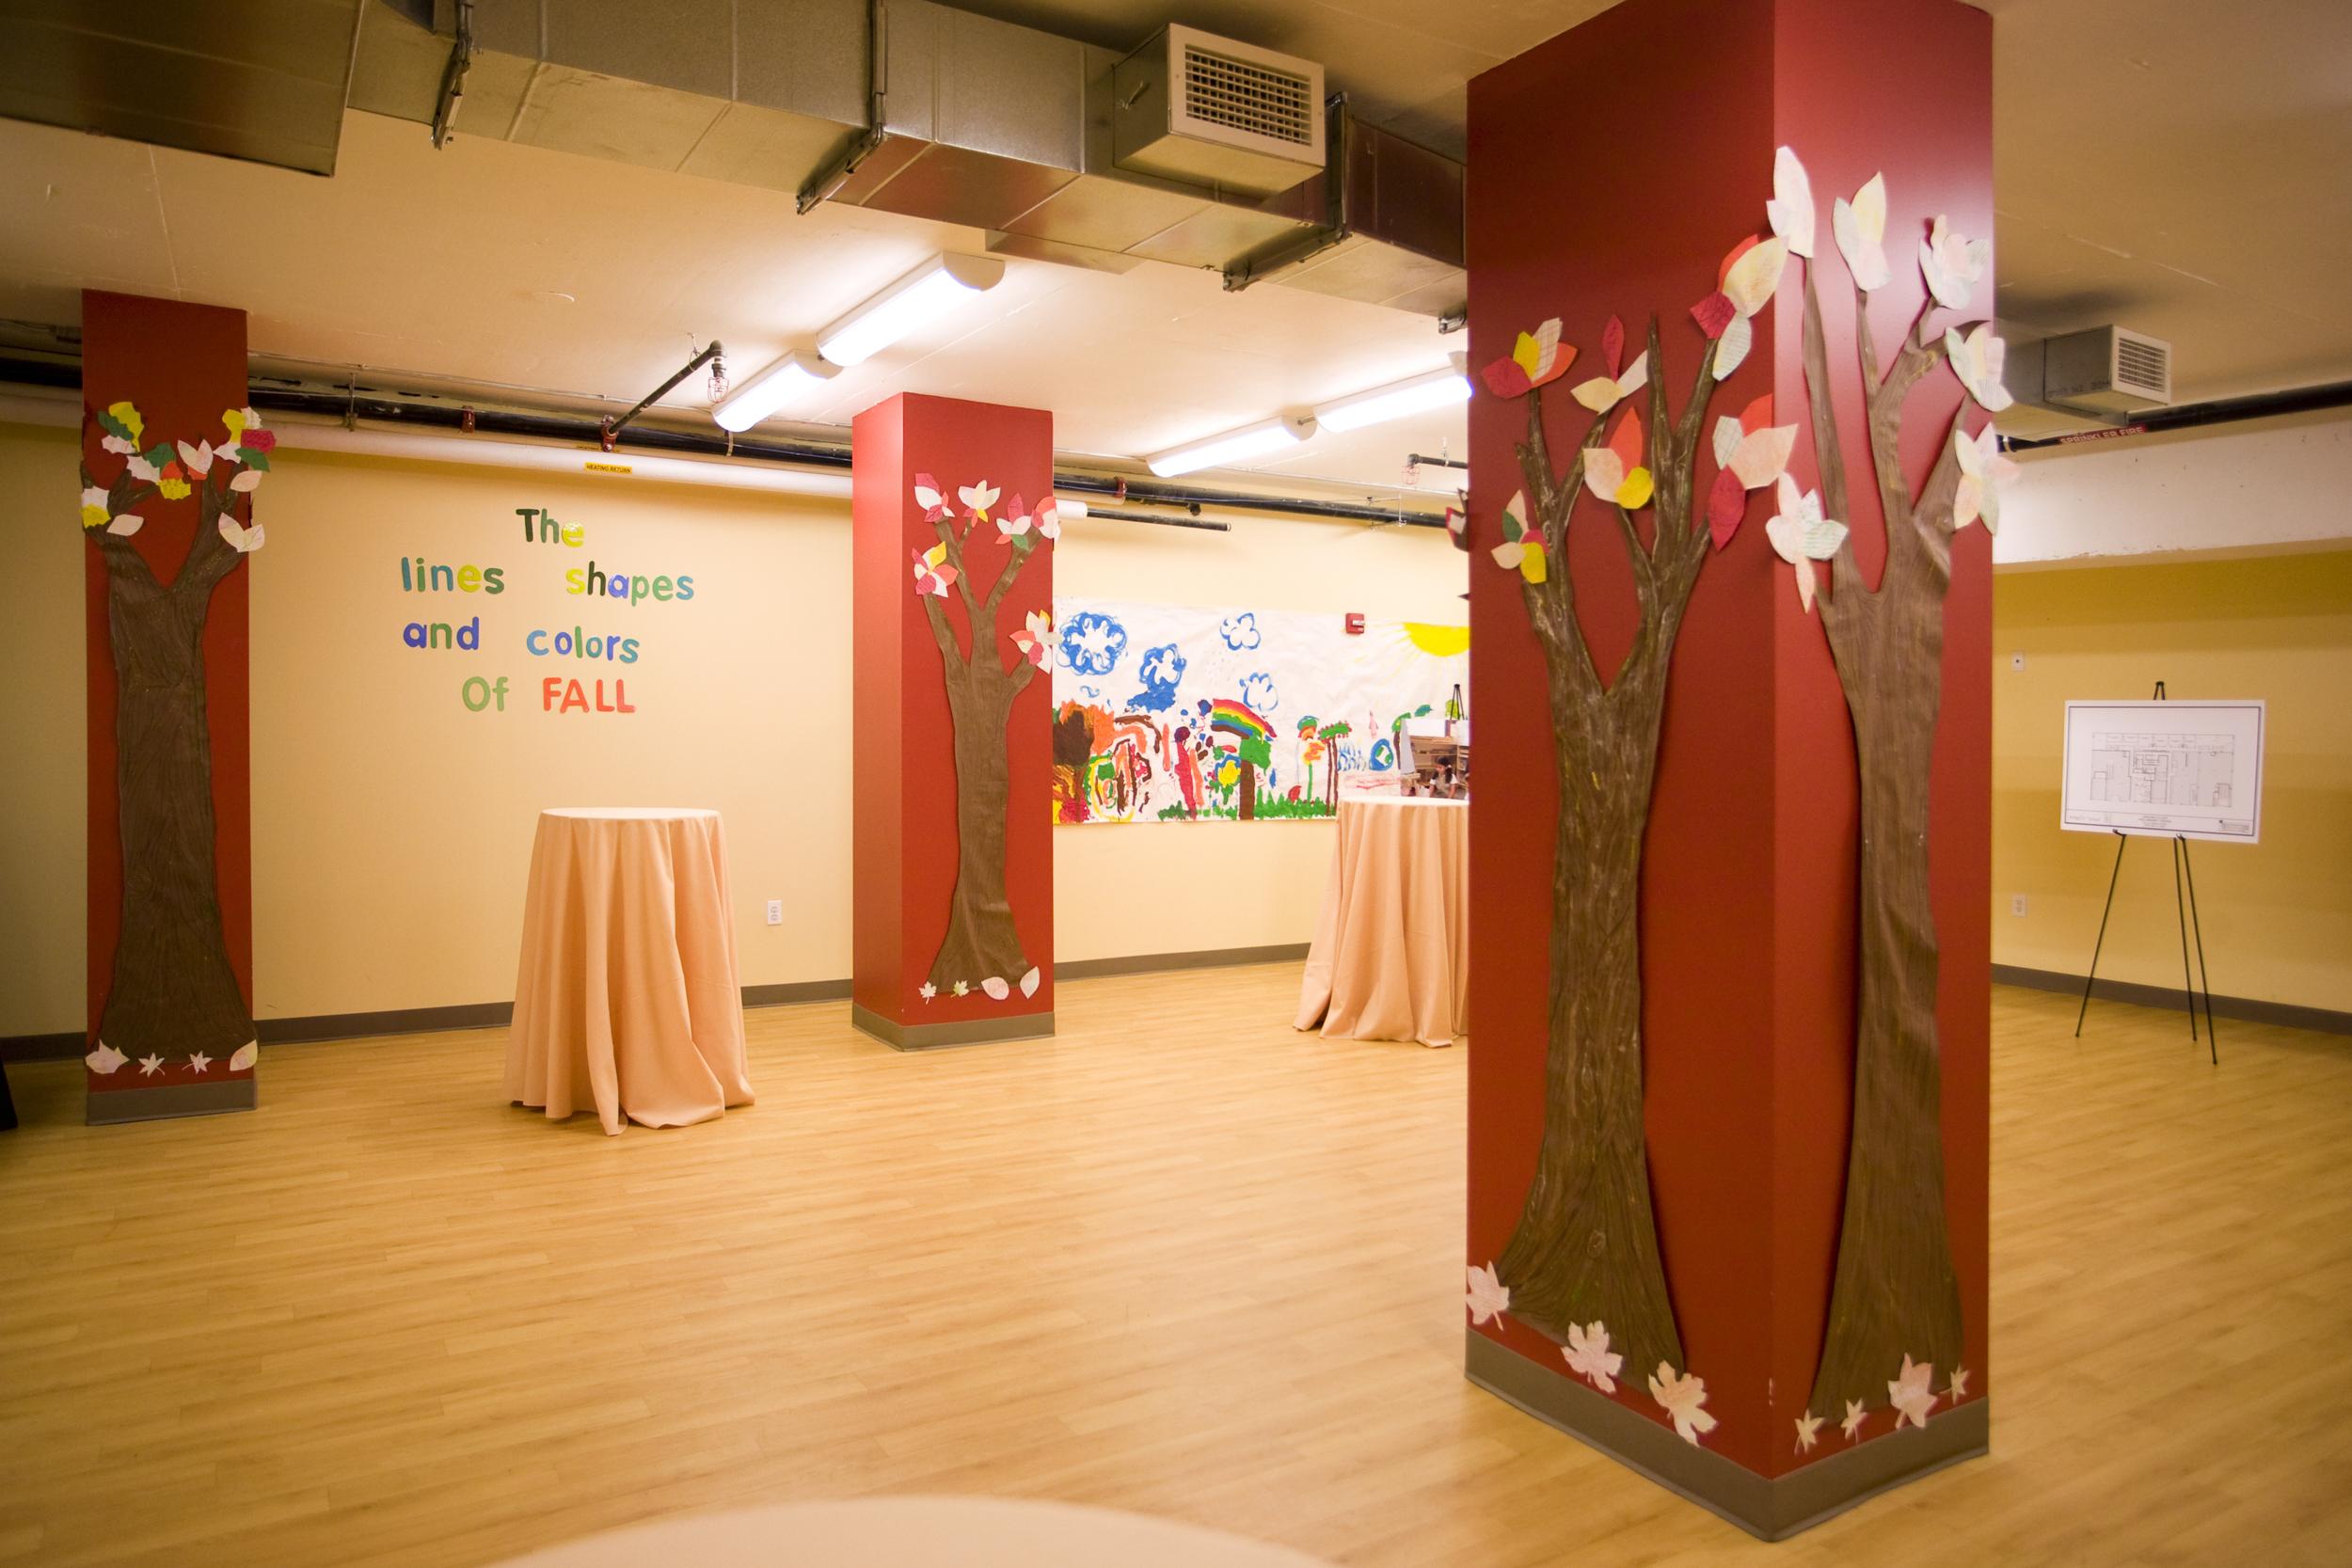 ceci_new_york_event_invitation_the_mandell_school_new_york_city_opening_creative_elementary_kindergarden_middle_school_nyc-20.jpg